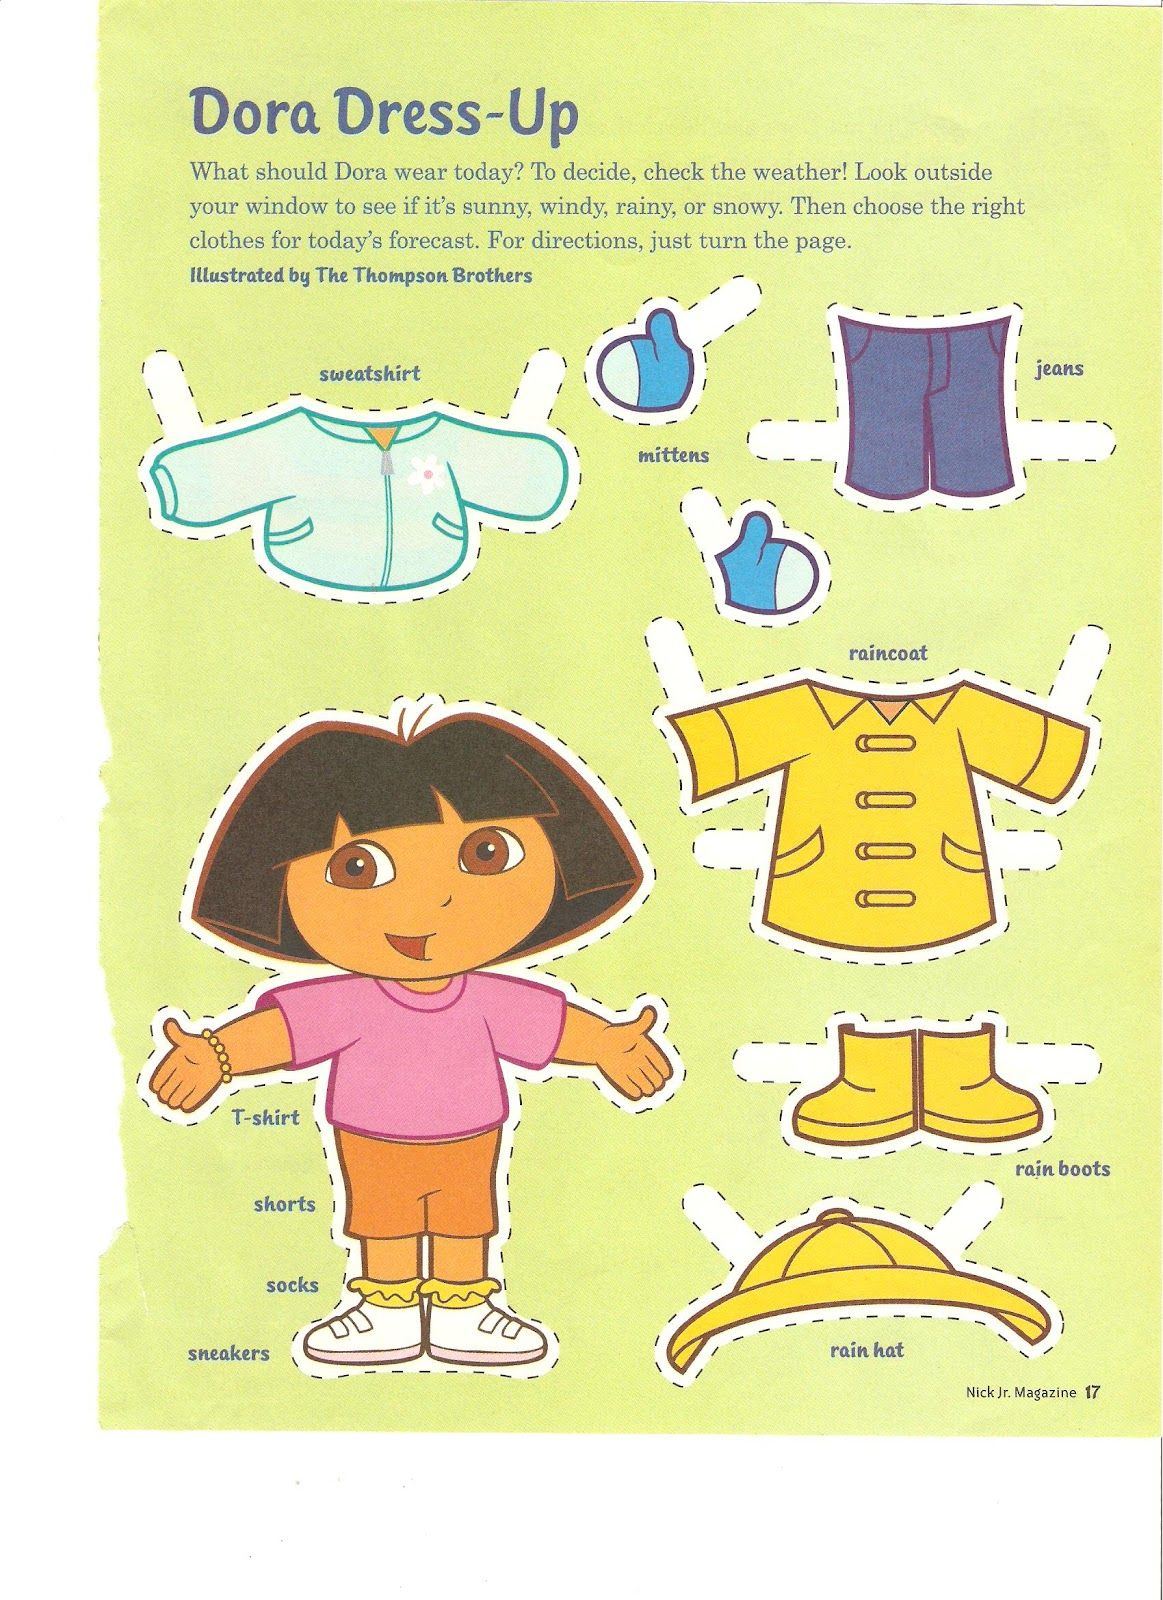 Dora the Explorer | PAPER DOLLS CHARACTERS | Pinterest | Nick jr ...